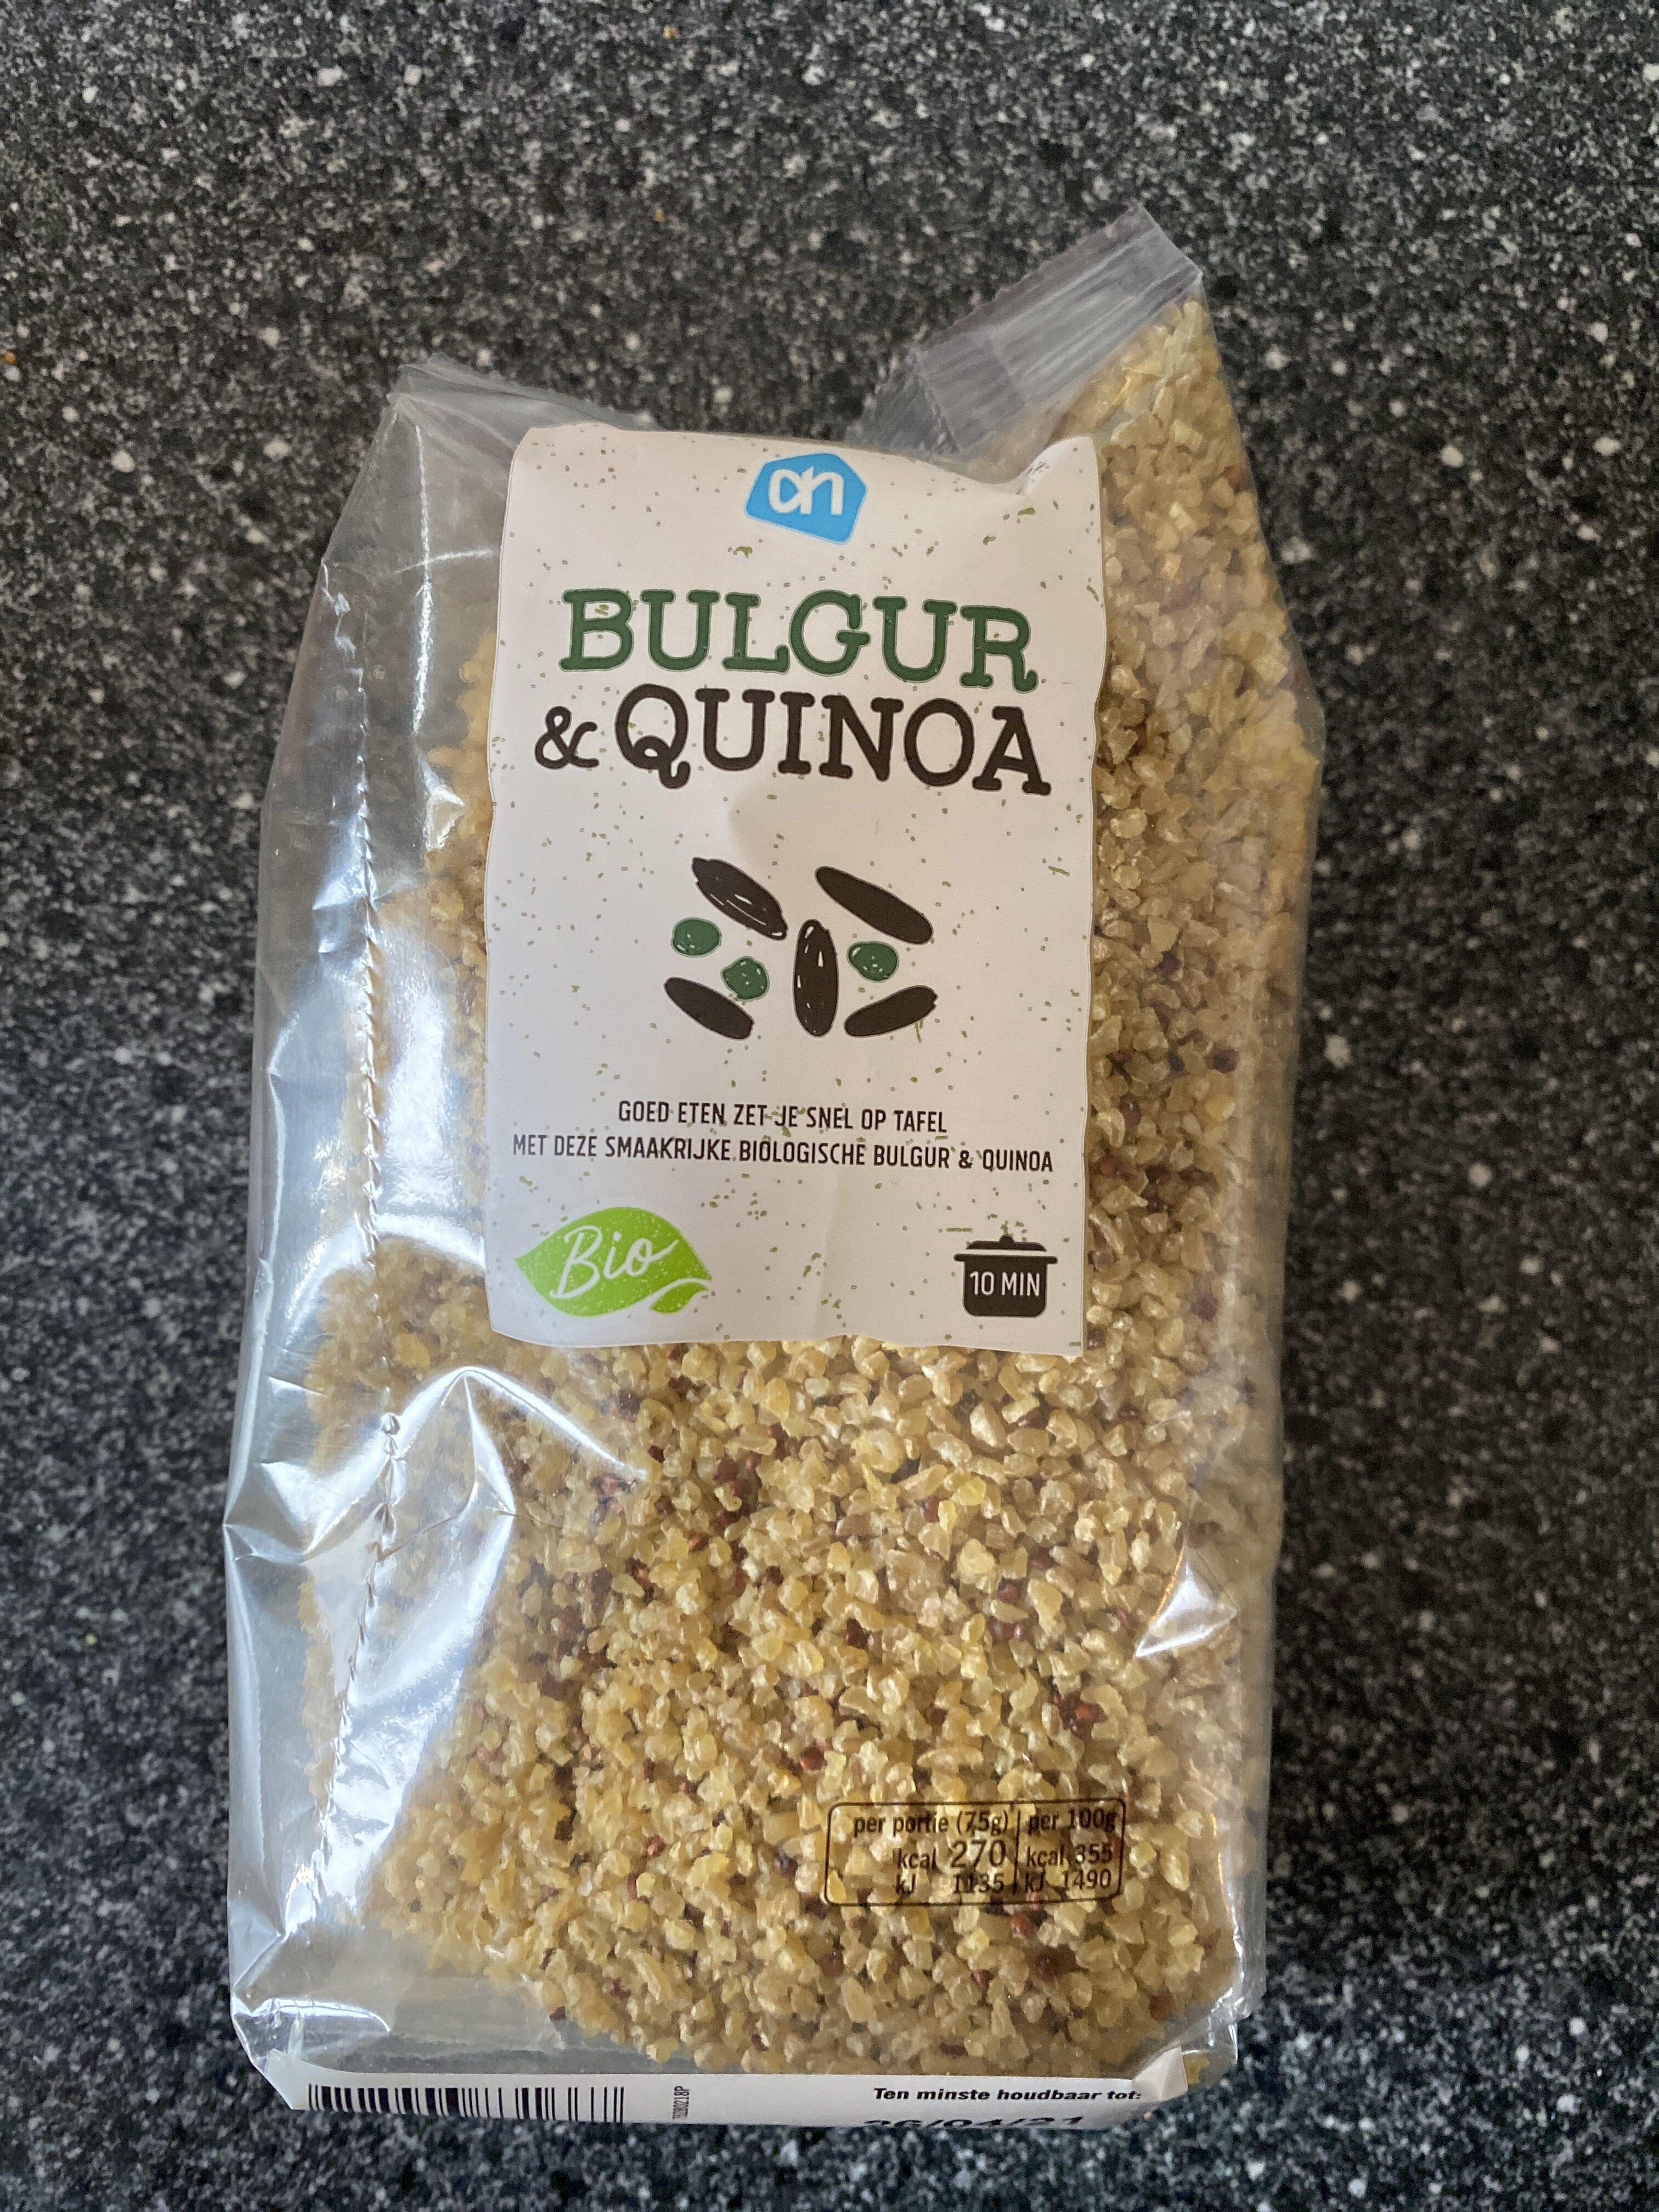 Bulgur & Quinoa - Product - en